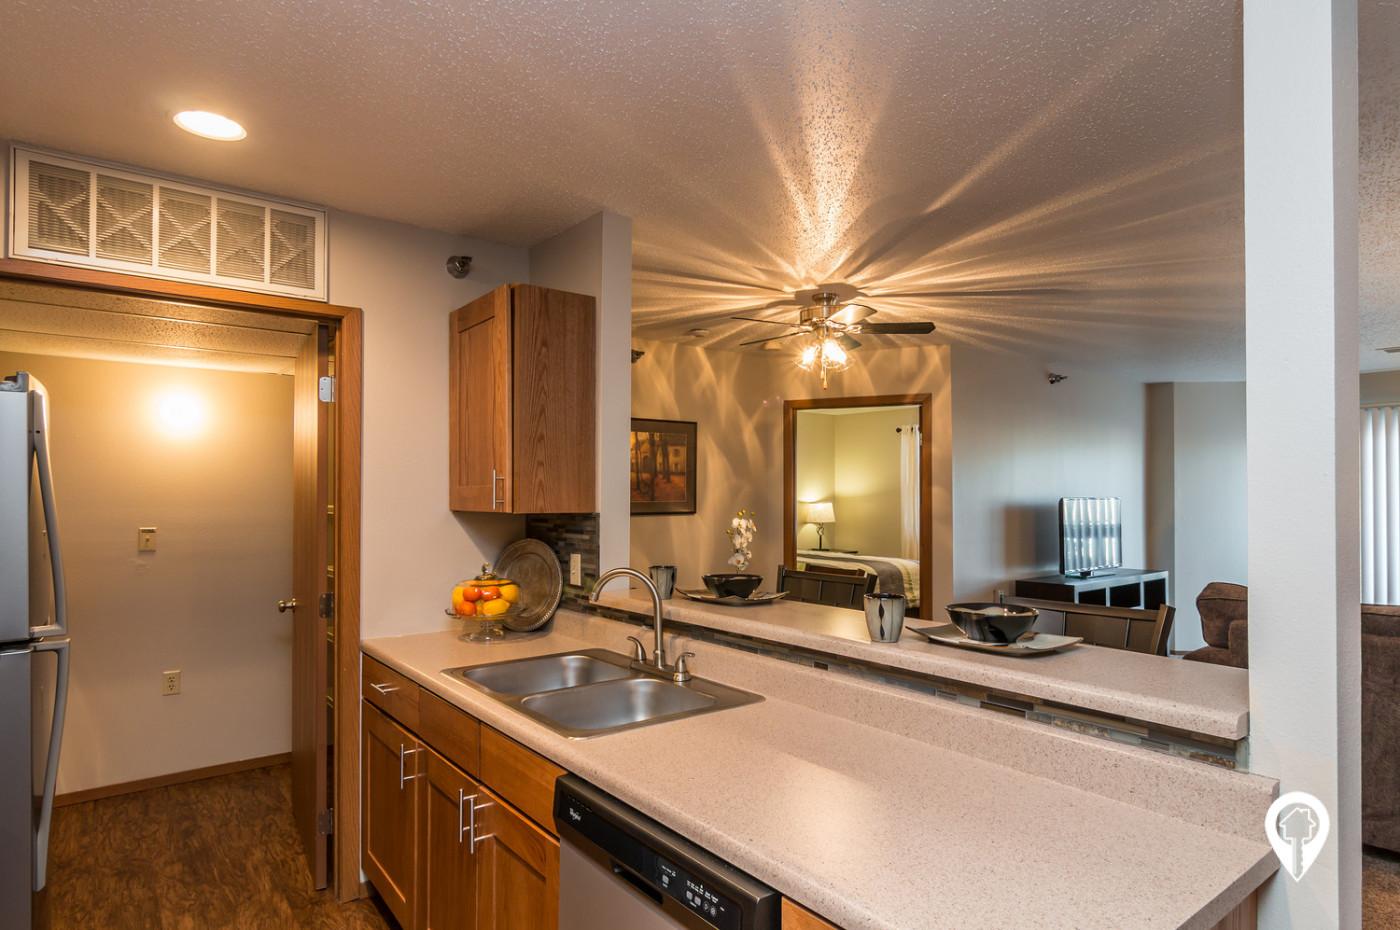 Oxbow-Park-Apartments-Open-Kitchens